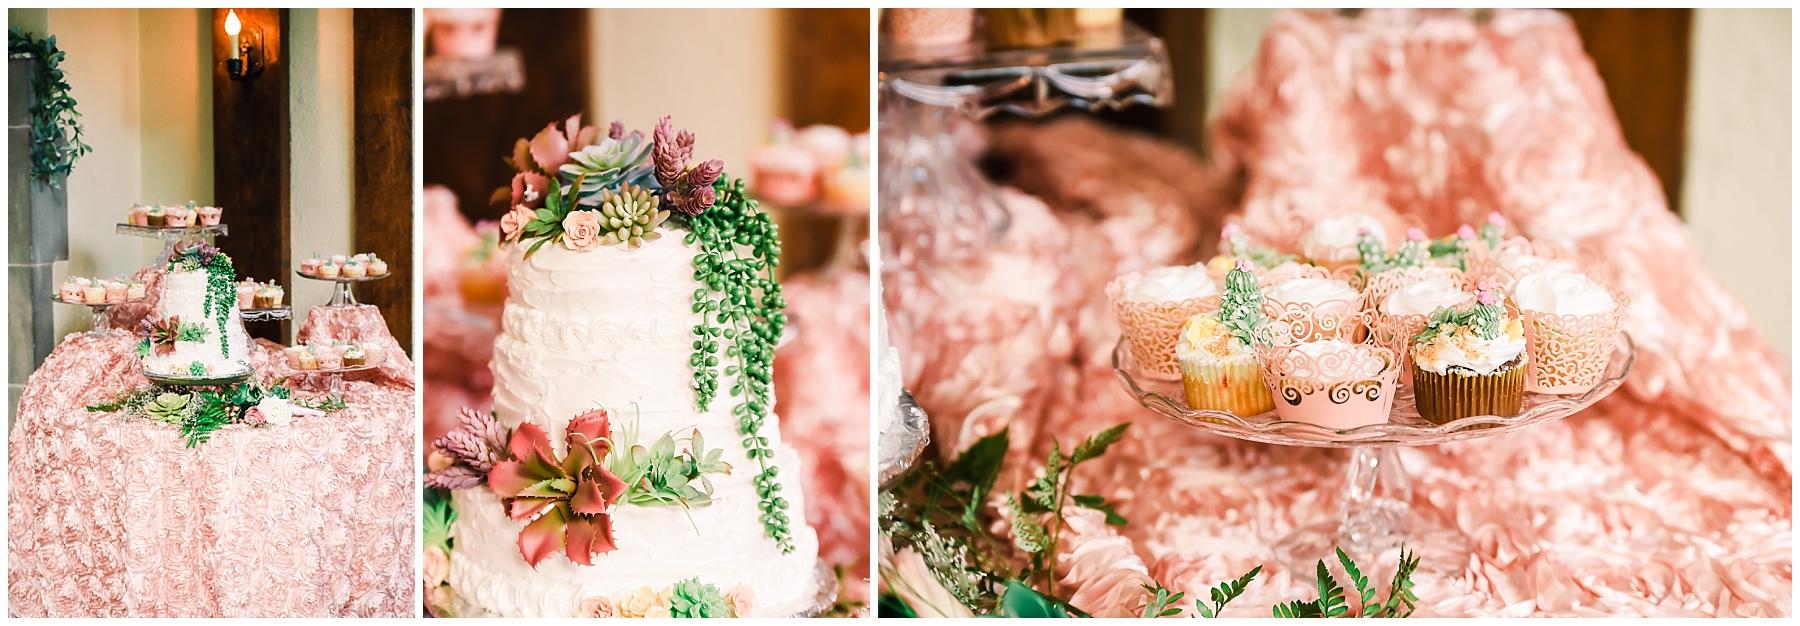 lafayette indiana wedding photography destination wedding fowler house mansion_0109.jpg